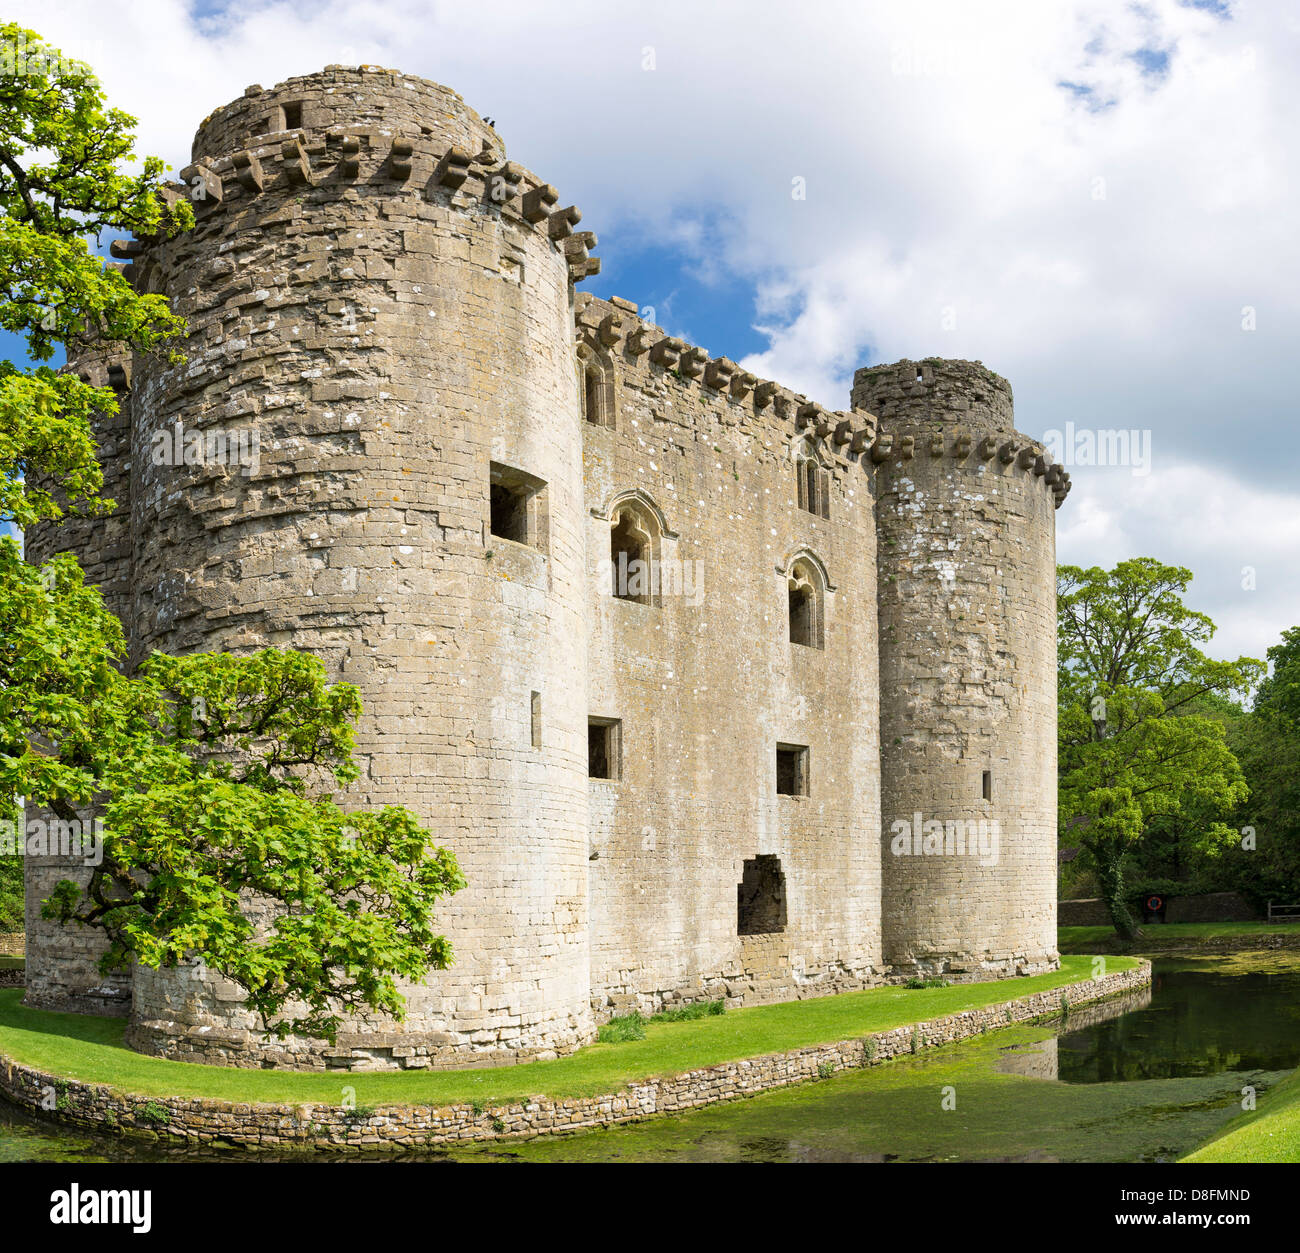 Medieval Nunney Castle, Somerset, England, UK - Stock Image